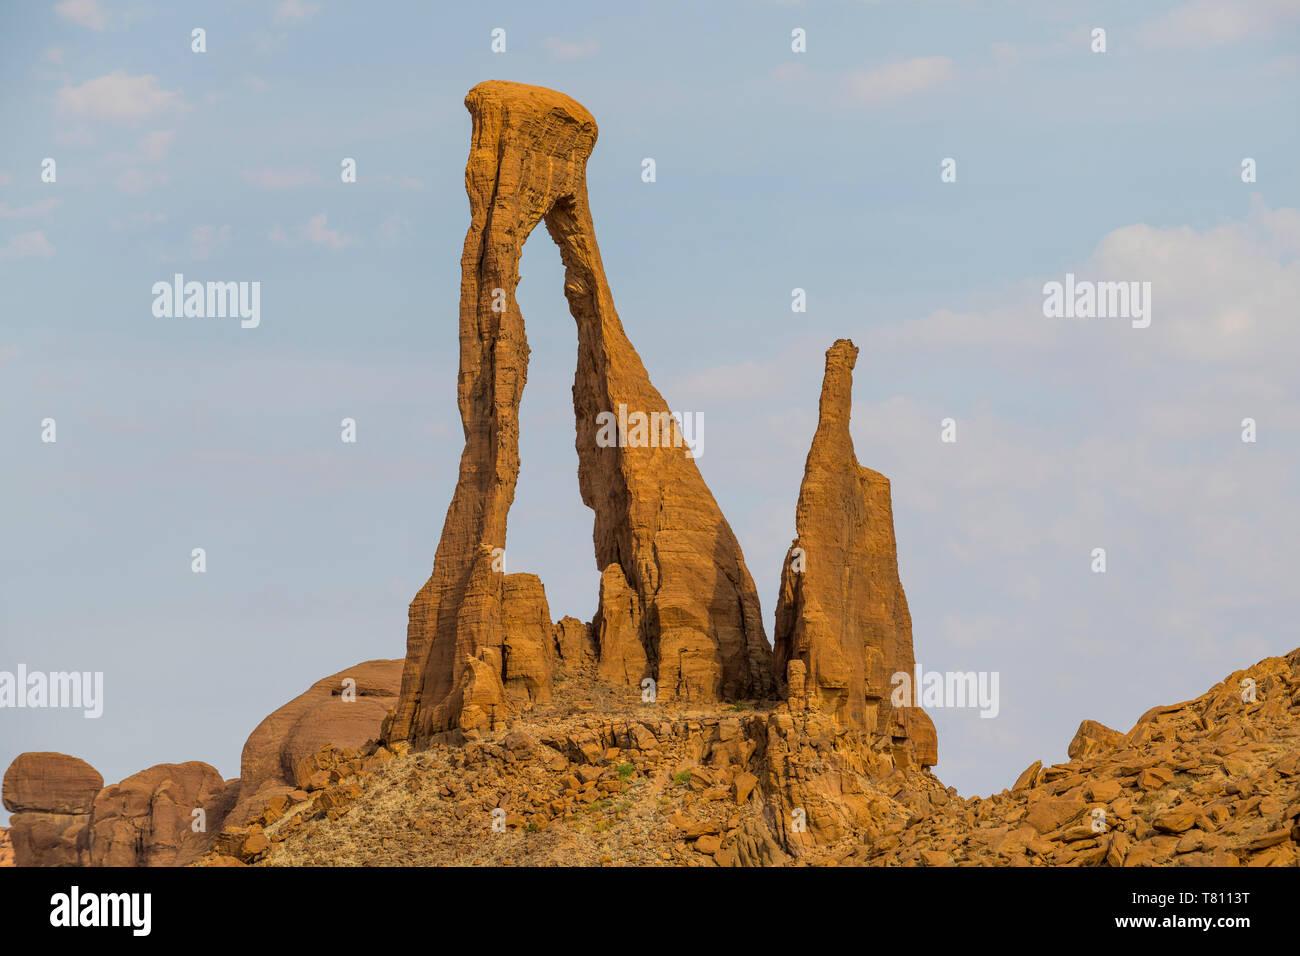 Ennedi Plateau, UNESCO World Heritage Site, Ennedi region, Chad, Africa Stock Photo